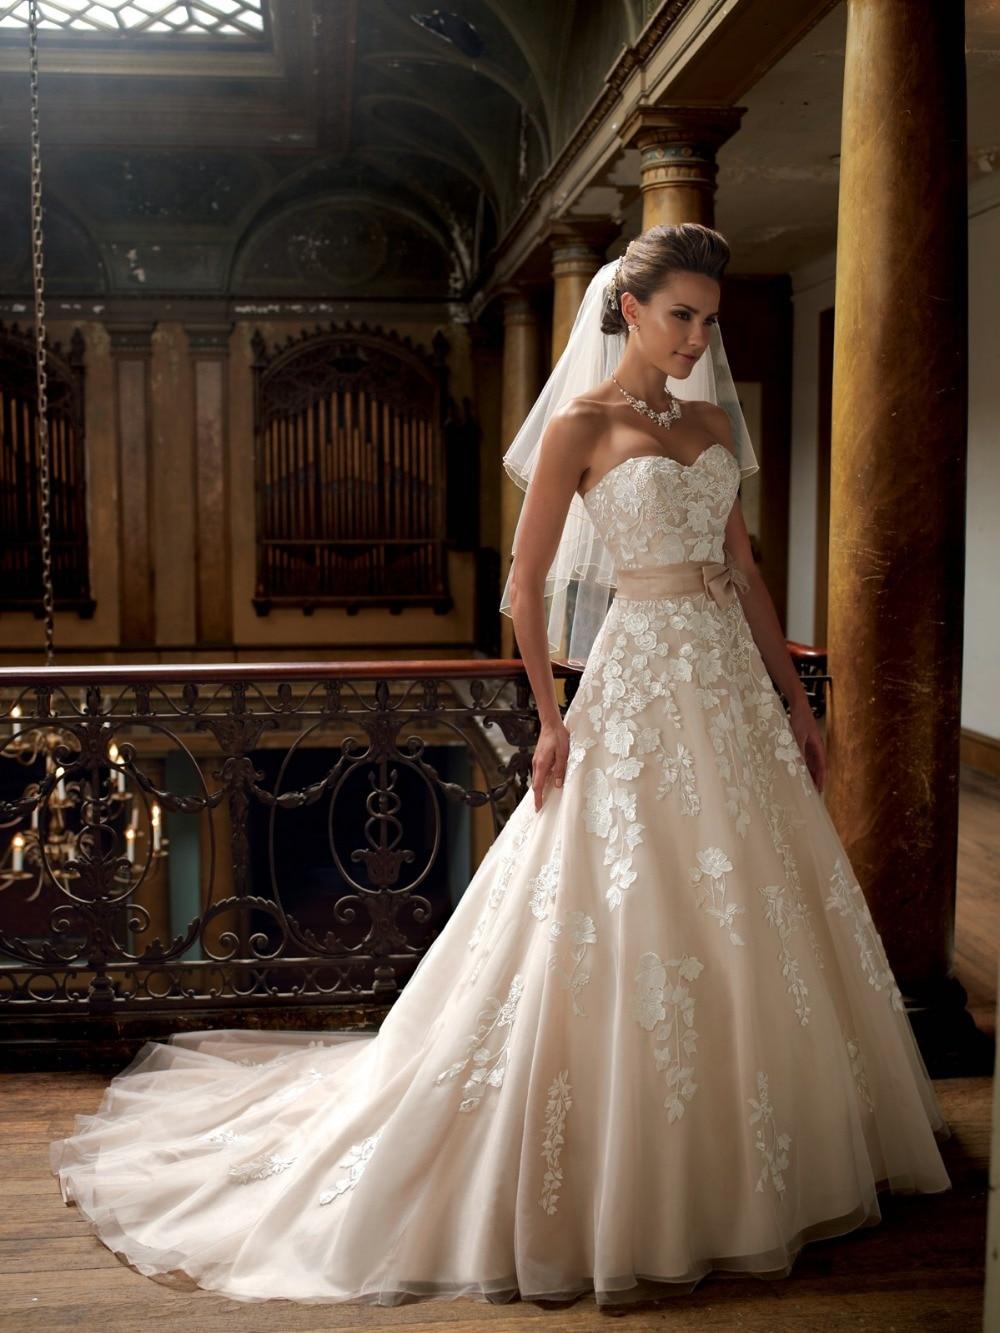 Medium Of Champagne Wedding Dress